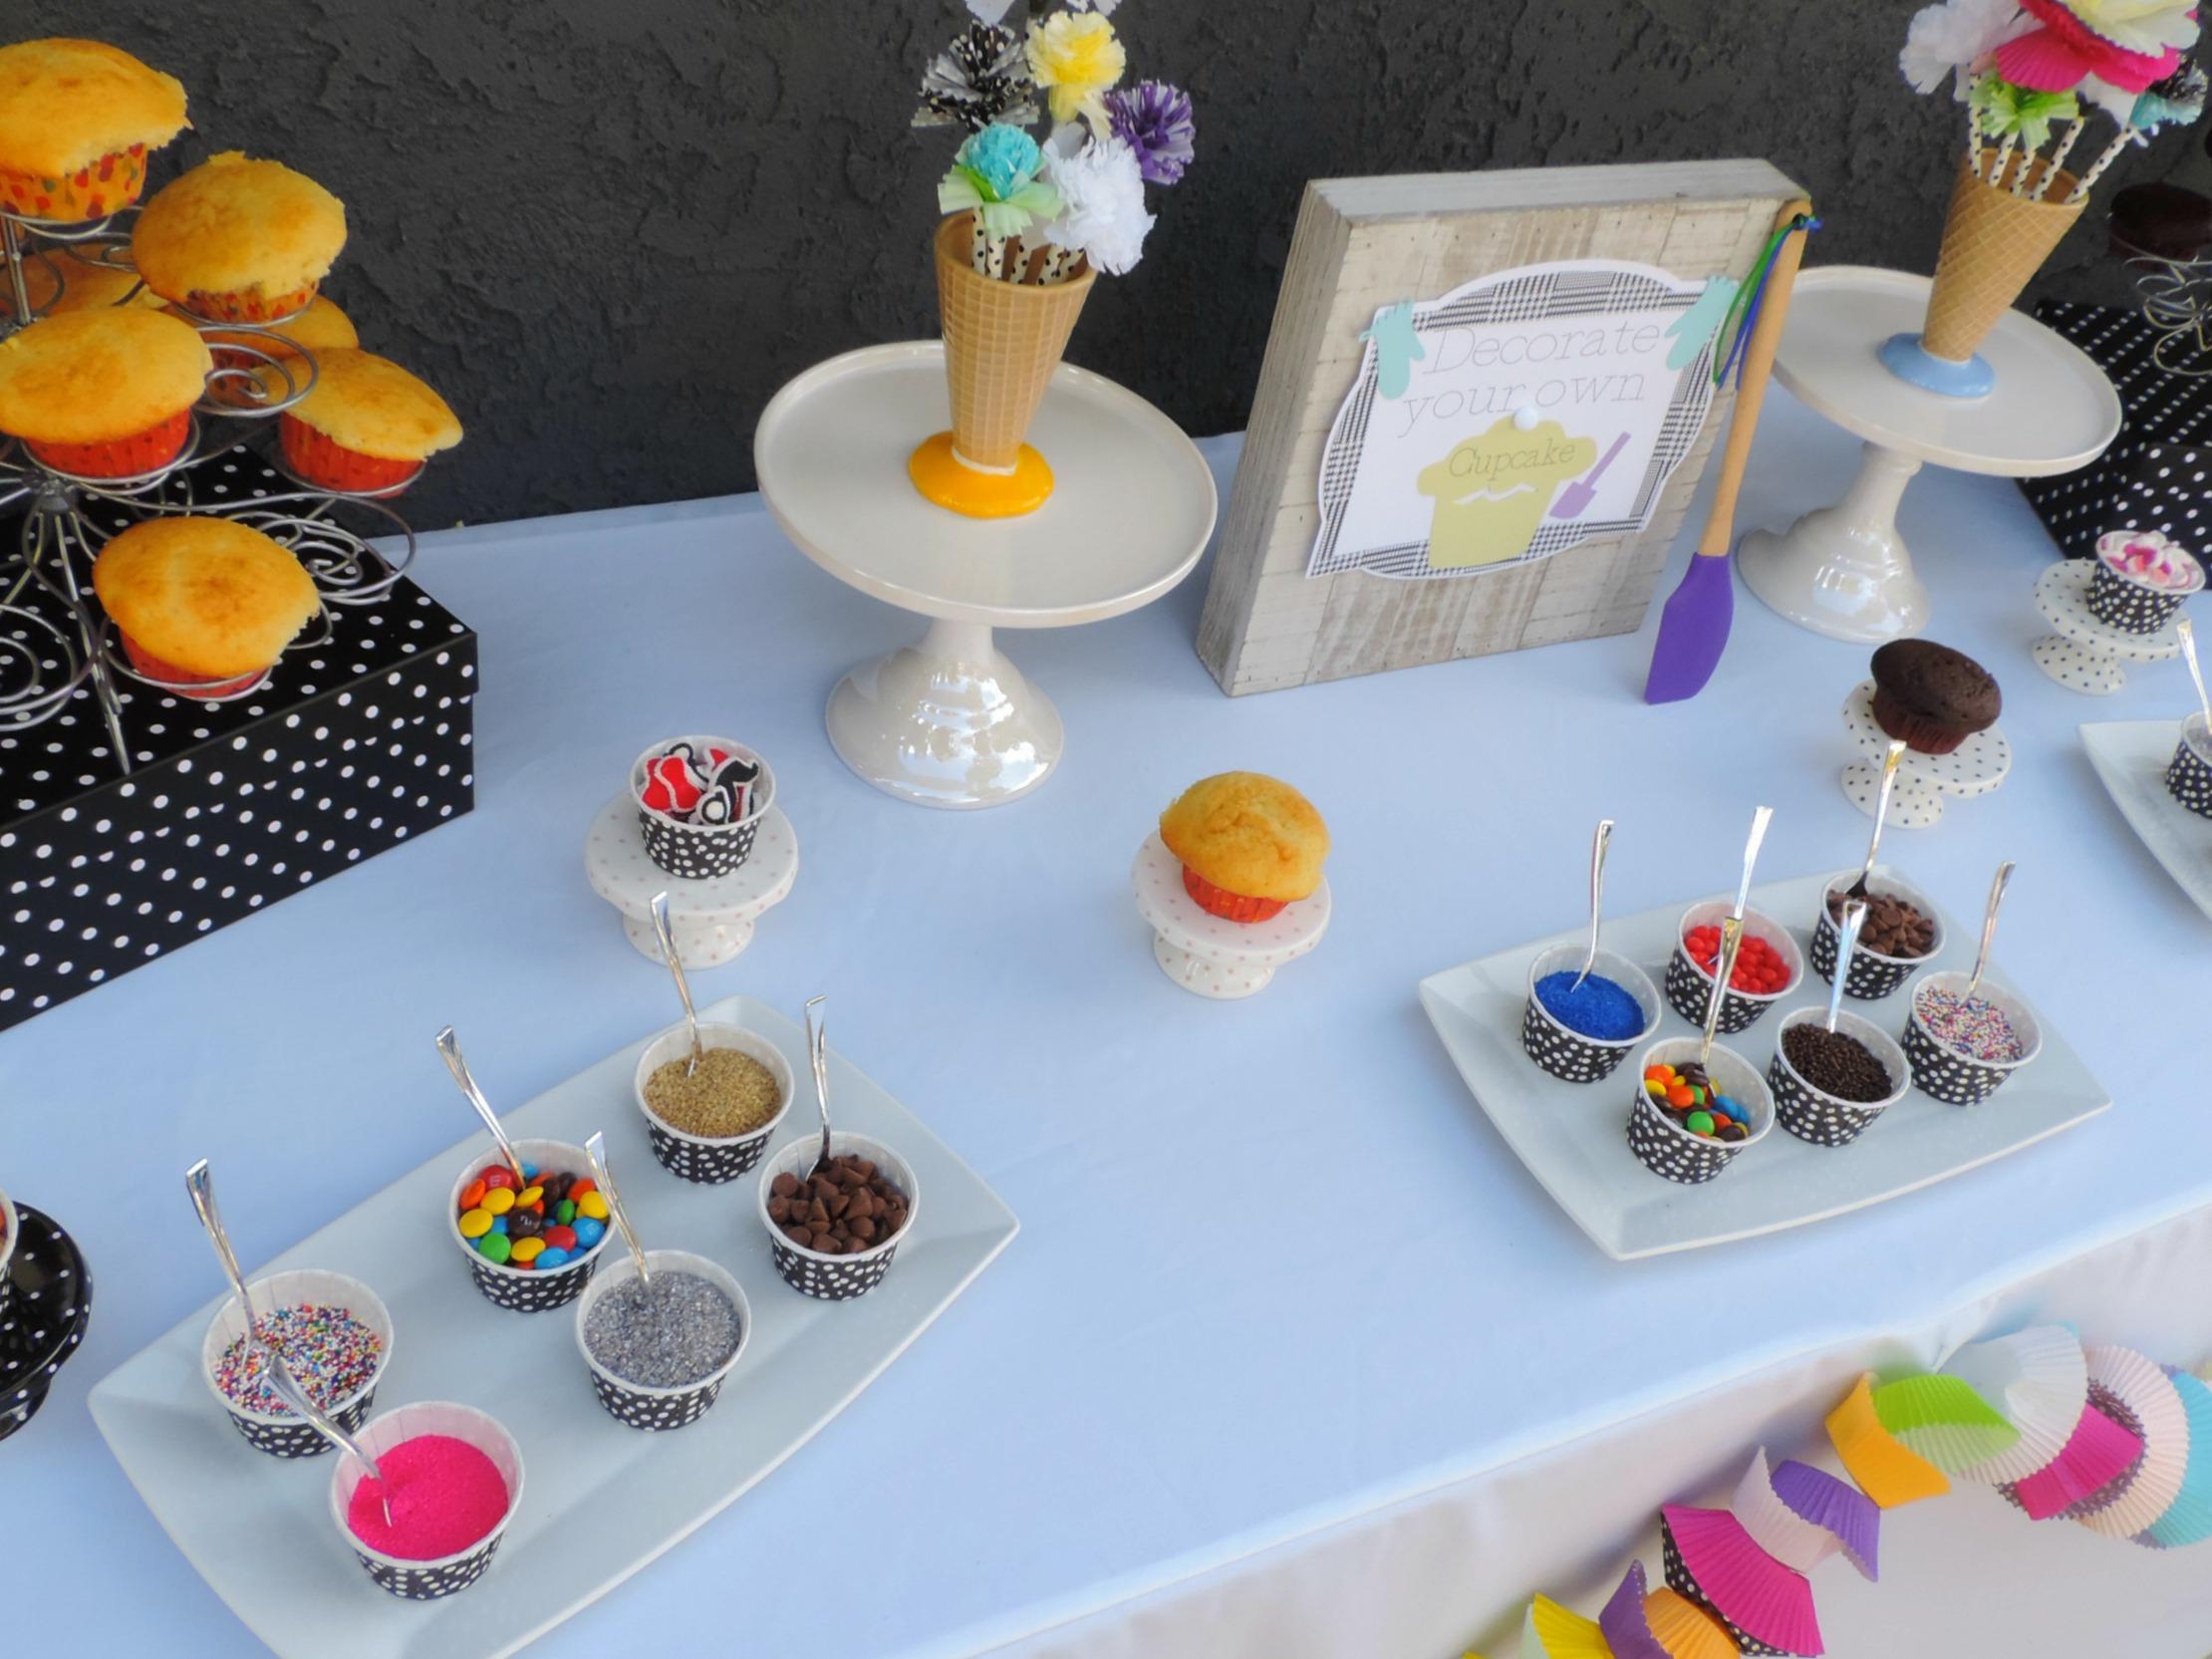 Cupcake war-cup cake wars-cupcake decorating party-cupcake decorating party ideas-www.SugarPartiesLA.com.jpg